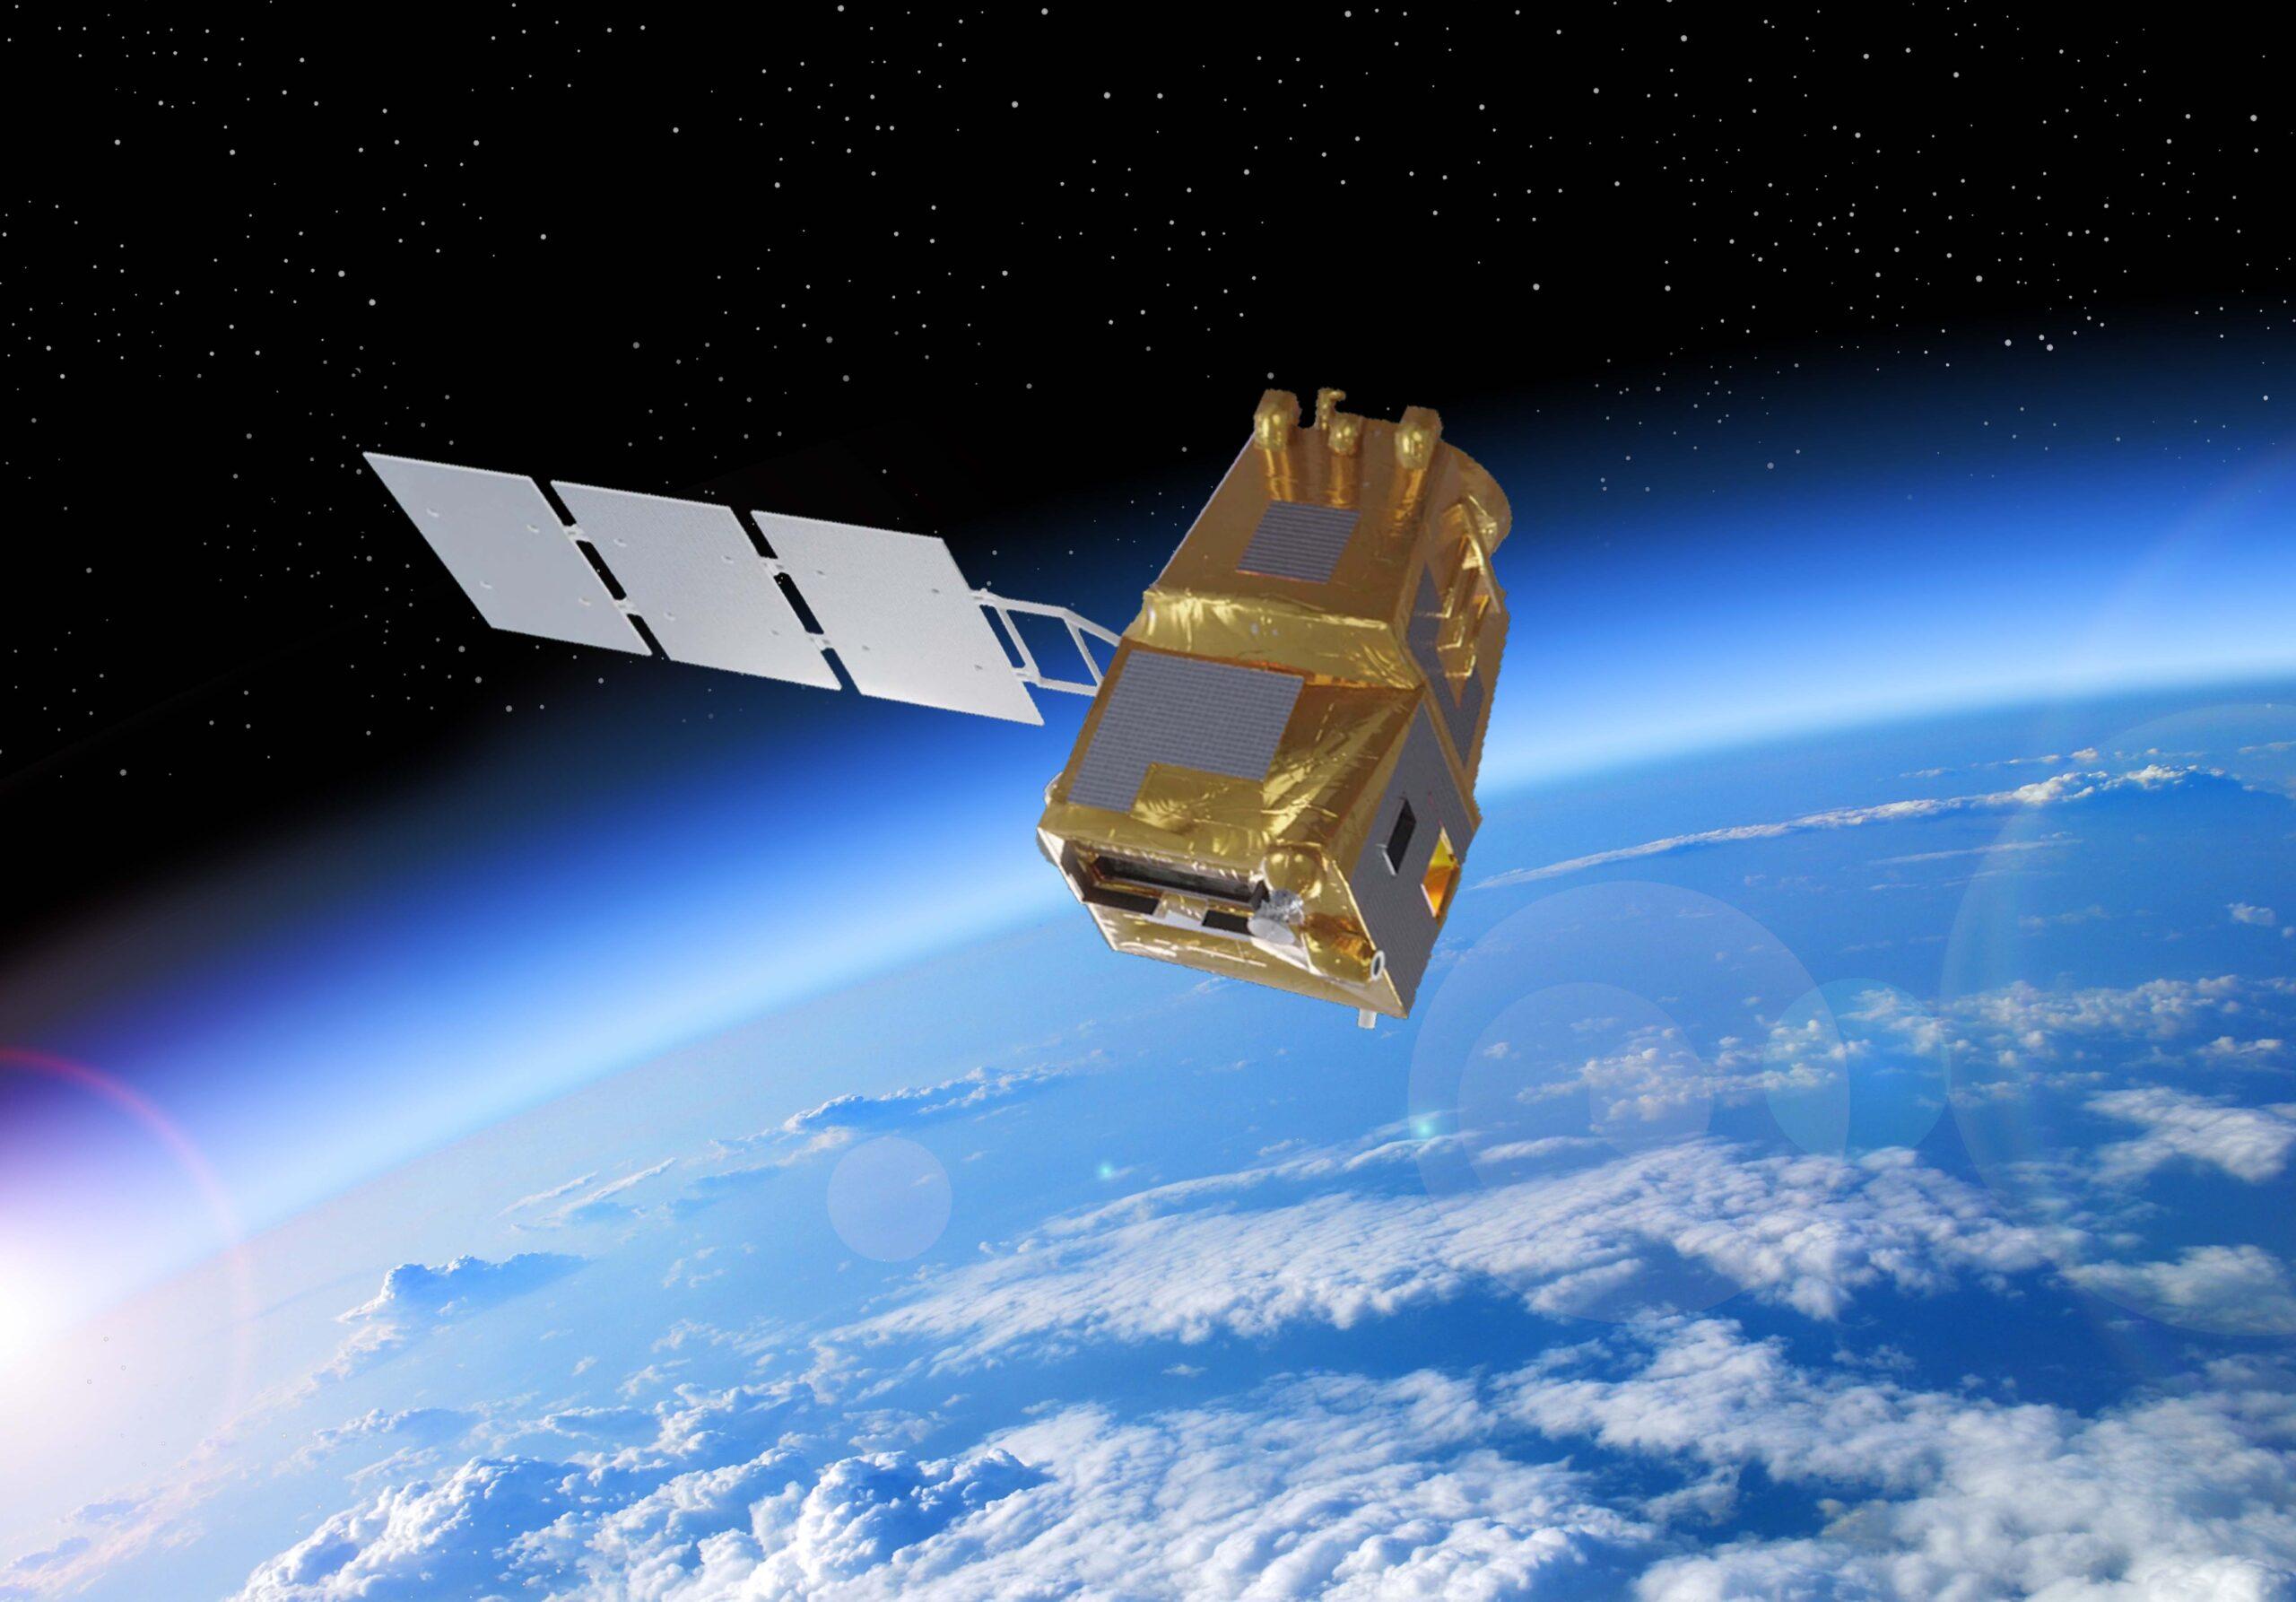 Un render del satellite LSTM copernicus. Credits: ESA/Thales Alenia Space